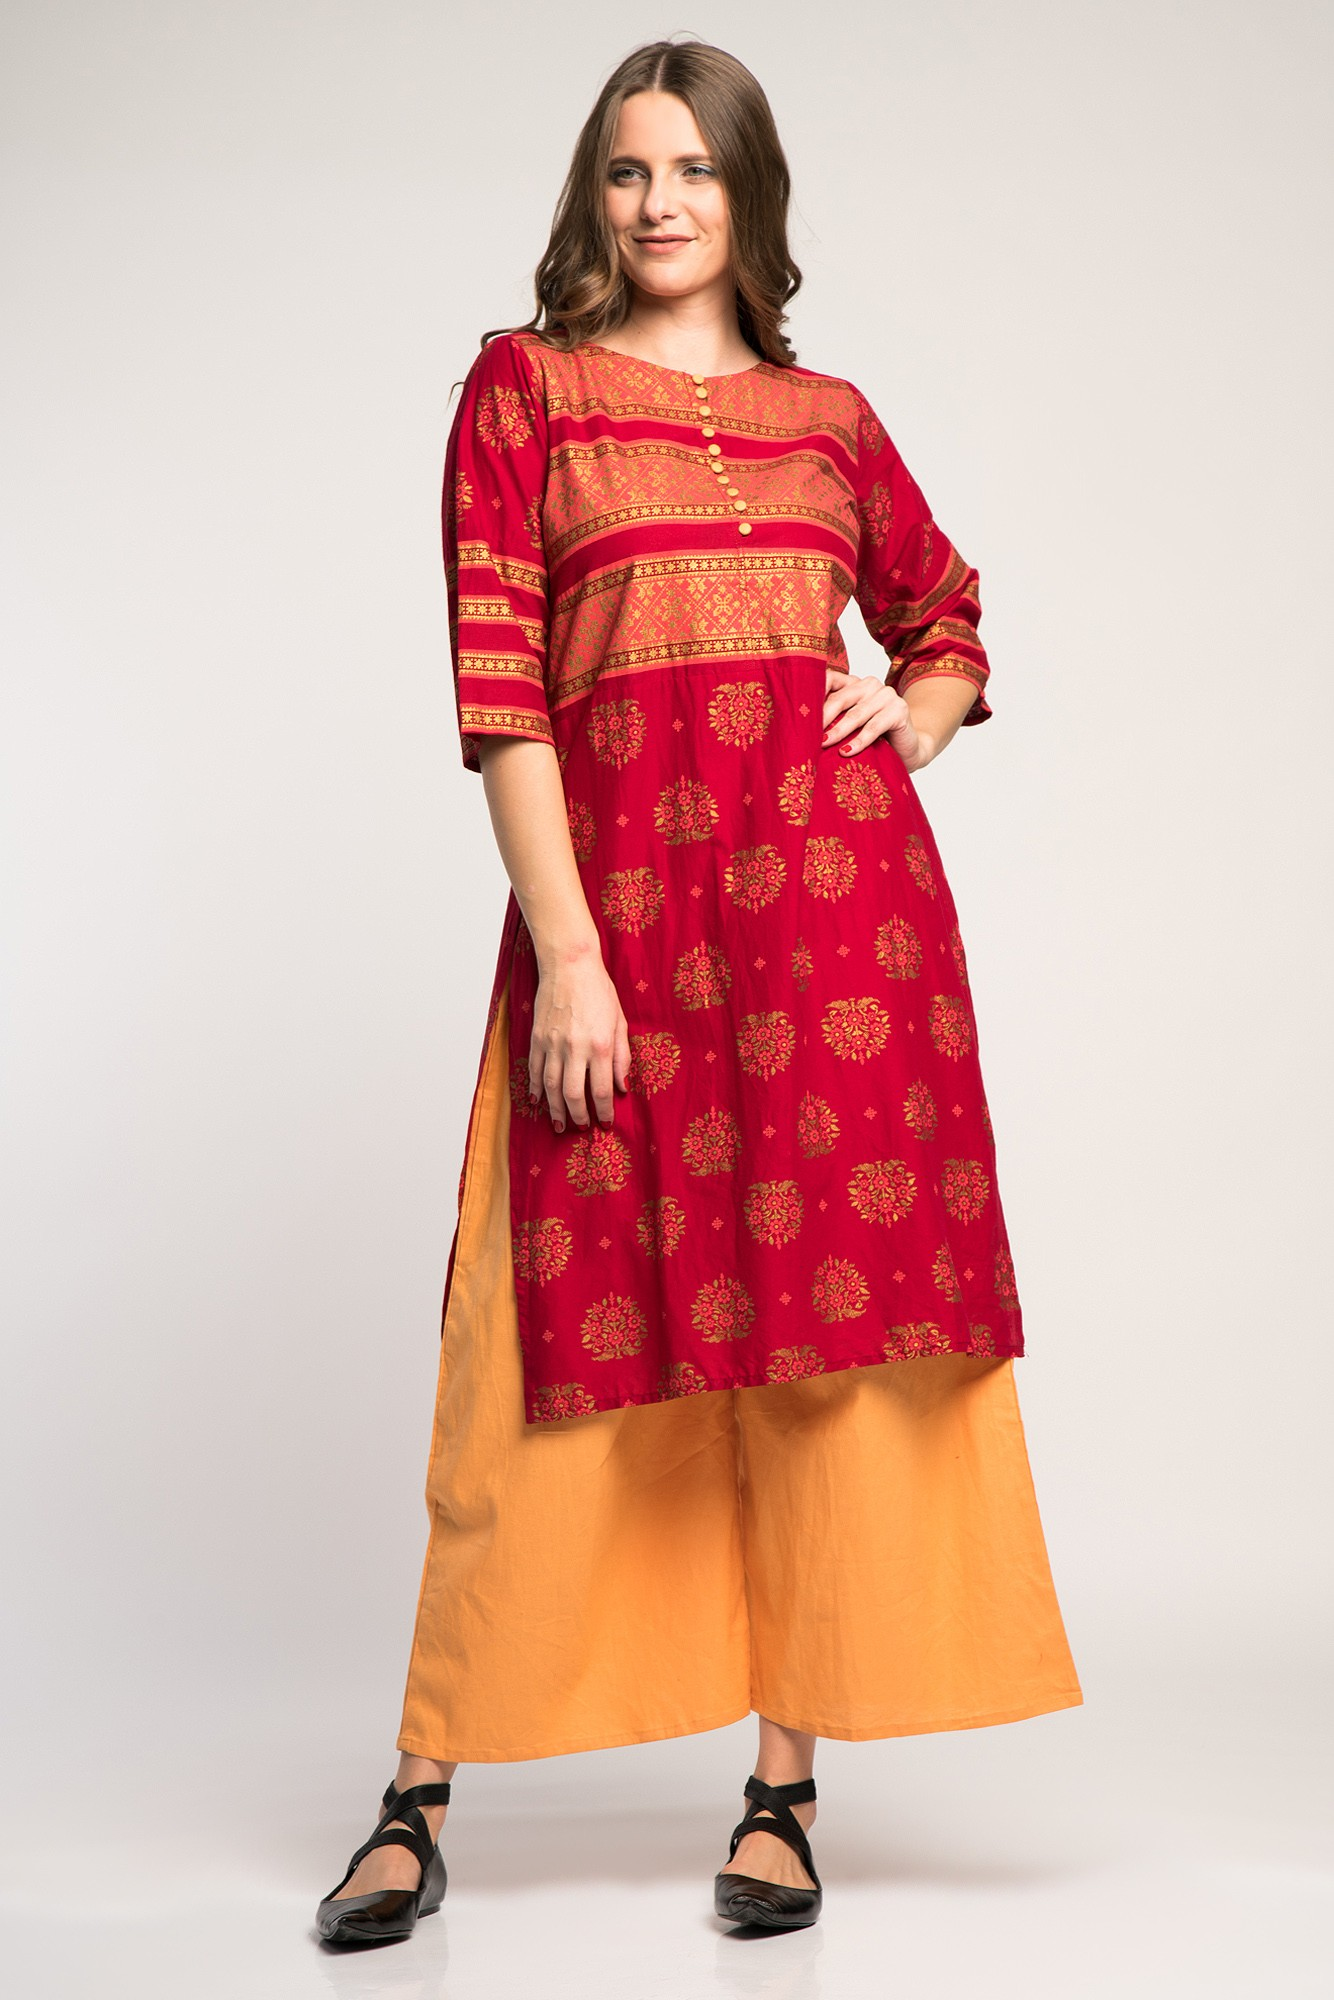 Costum traditional indian cu pantaloni portocalii si broderie aurie